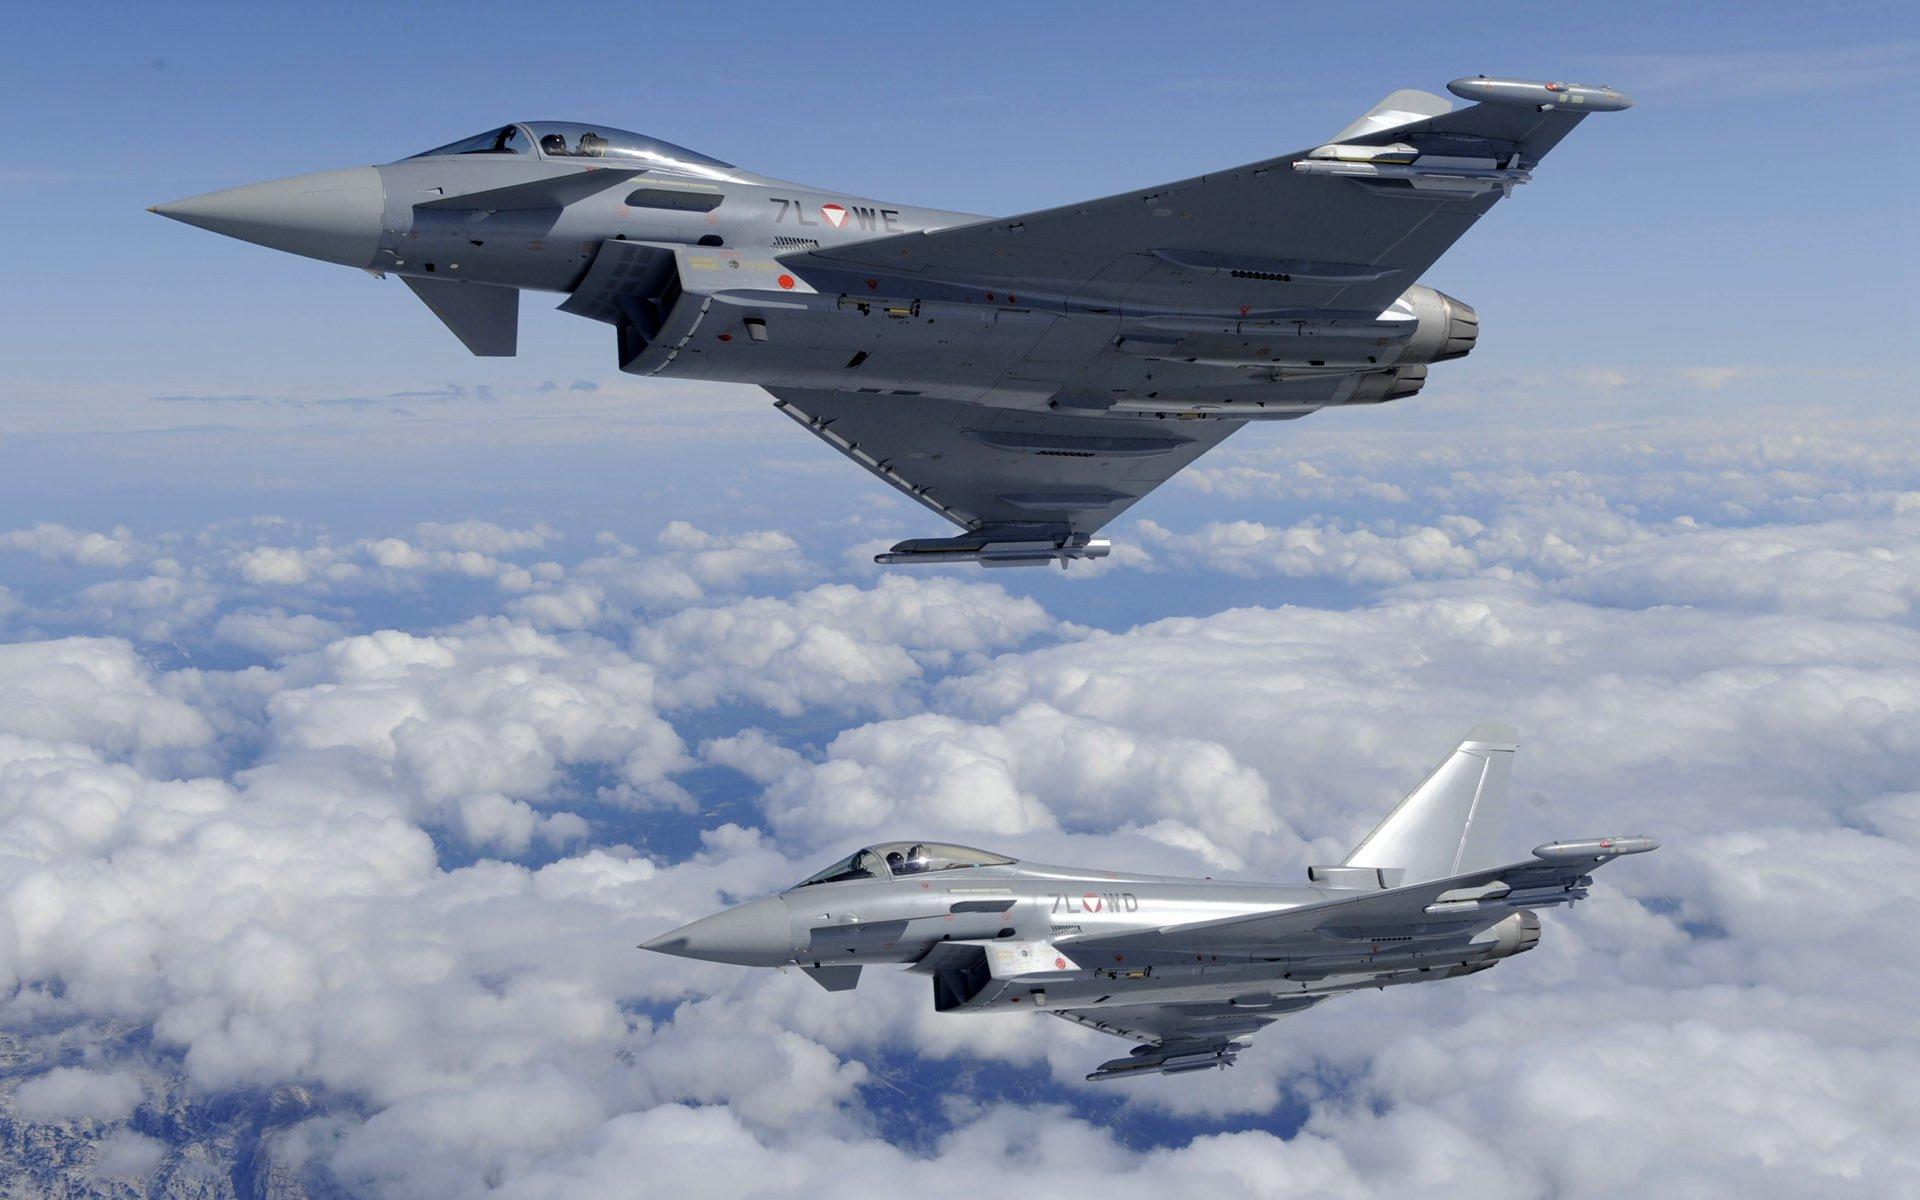 Обои Облака, полет, истребители. Авиация foto 11